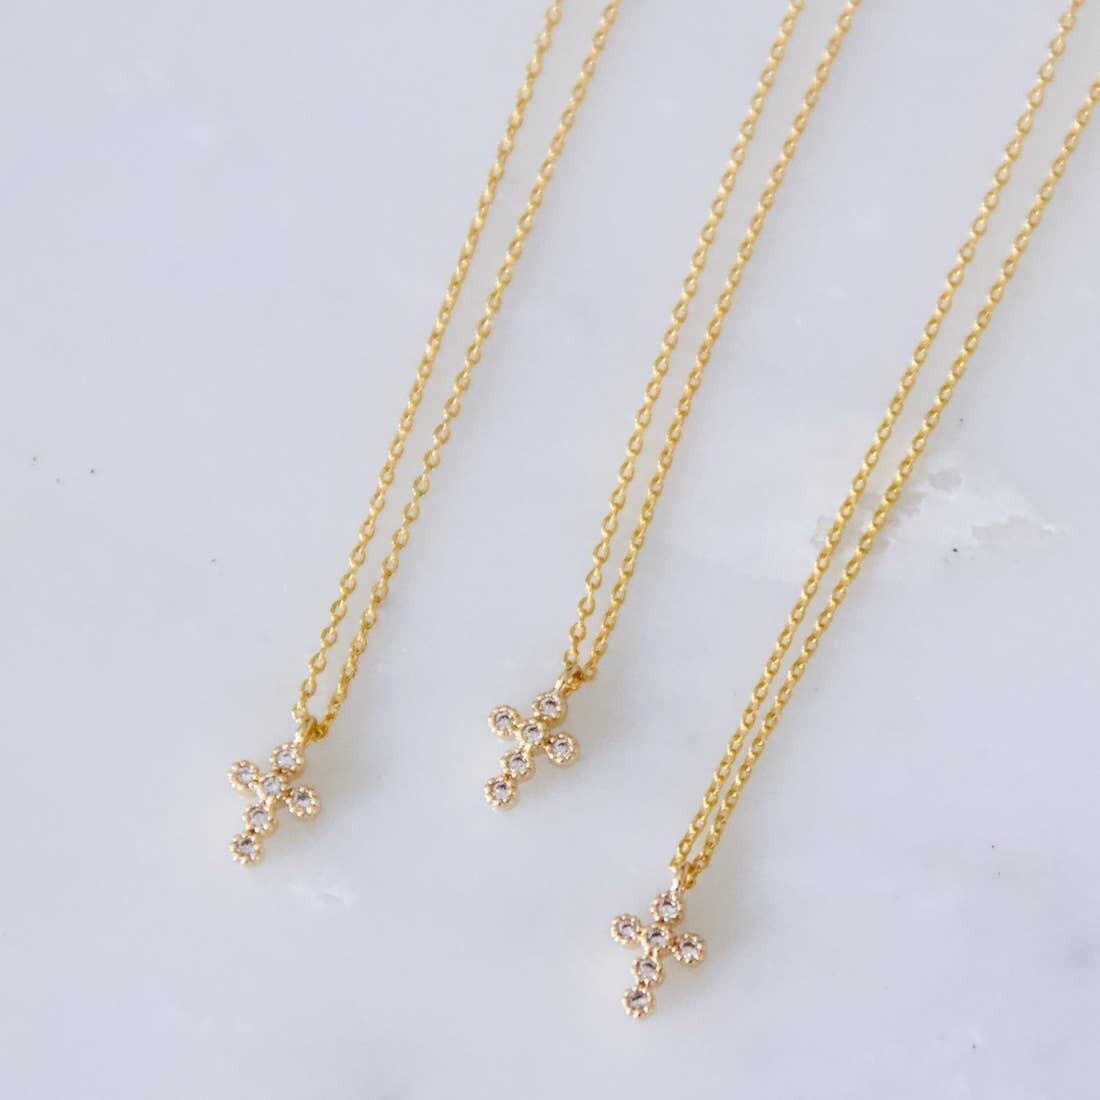 Dainty Zircon Cross Necklace